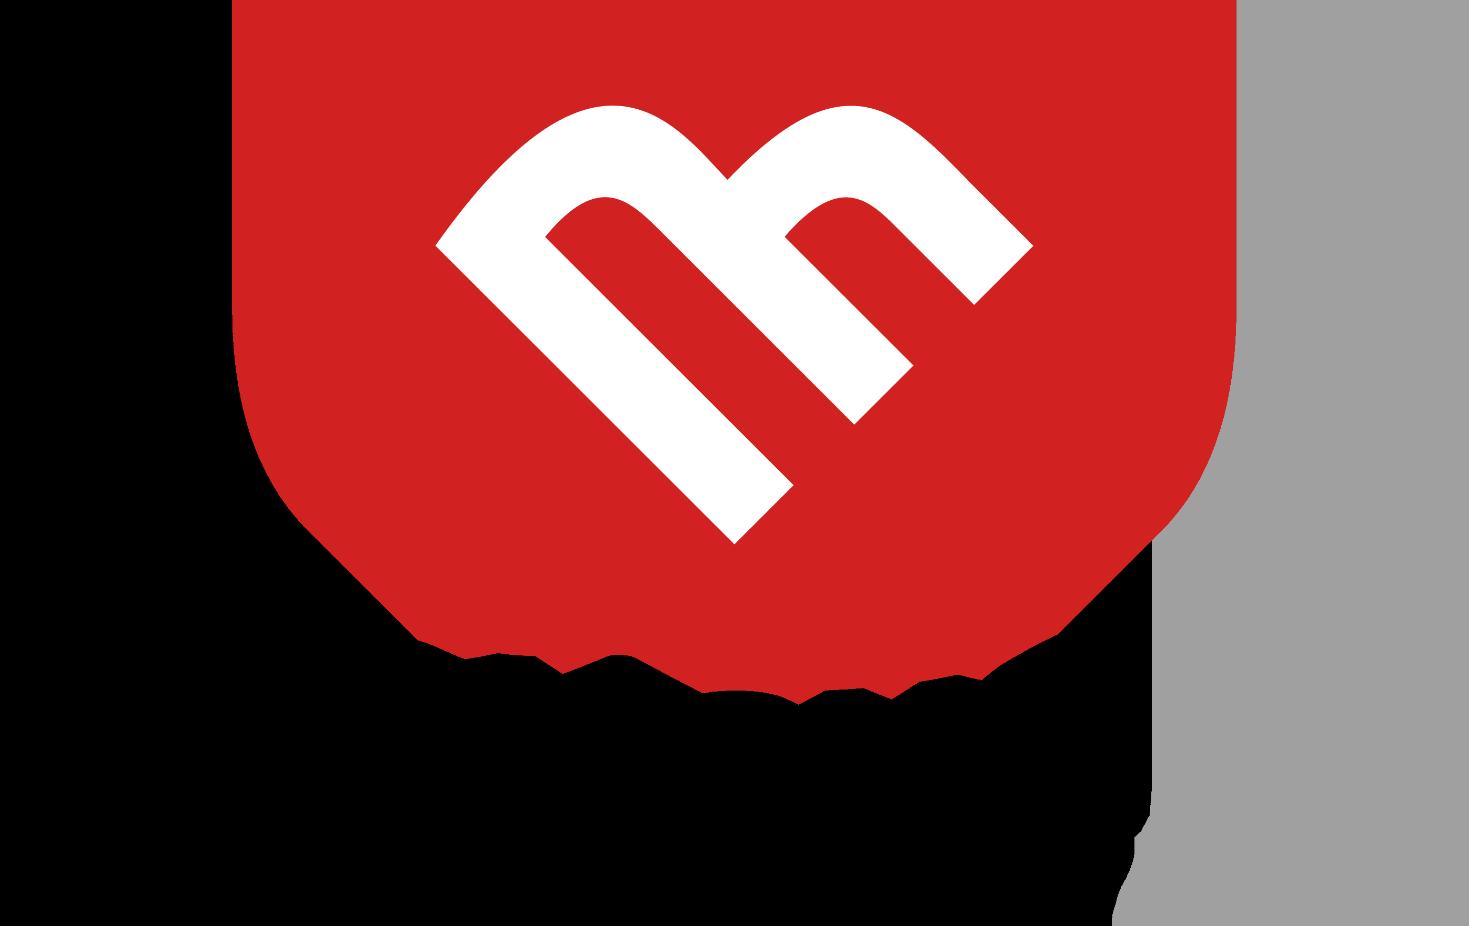 Výsledek obrázku pro www.martinus.cz logo